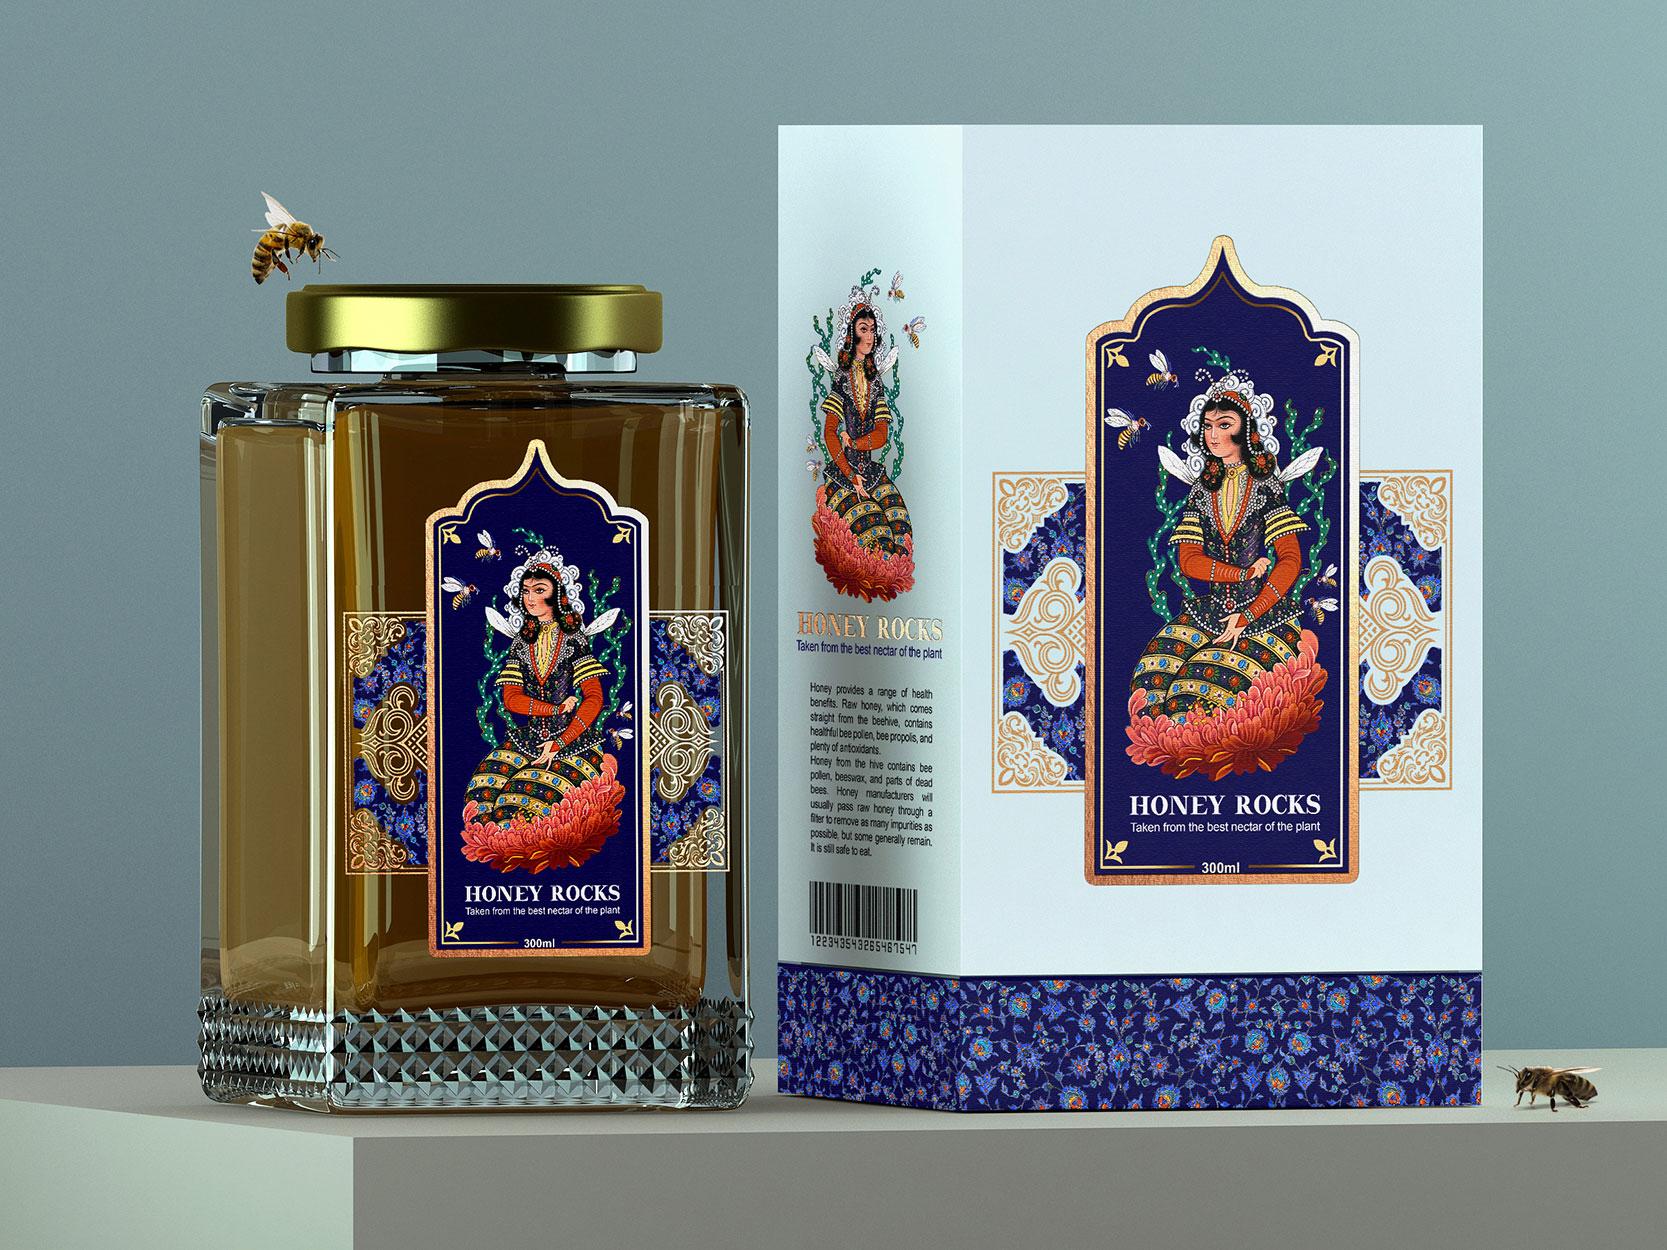 Taha Fakouri Creates Packaging Design for Honey Rock